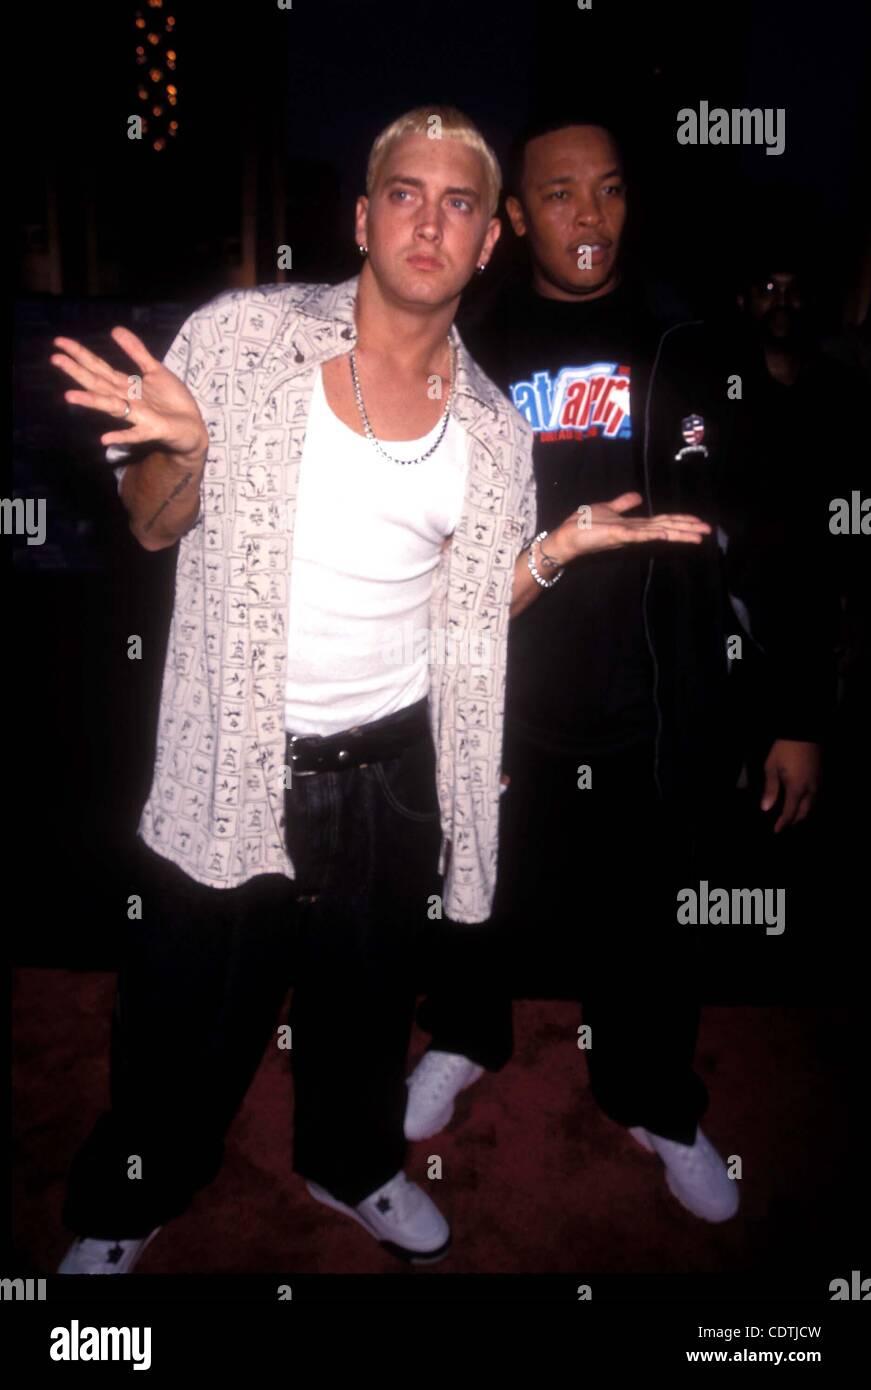 9 1999 NEW YORK1999 MTV VIDEO MUSIC AWARDS AT METROPOLITAN OPERA